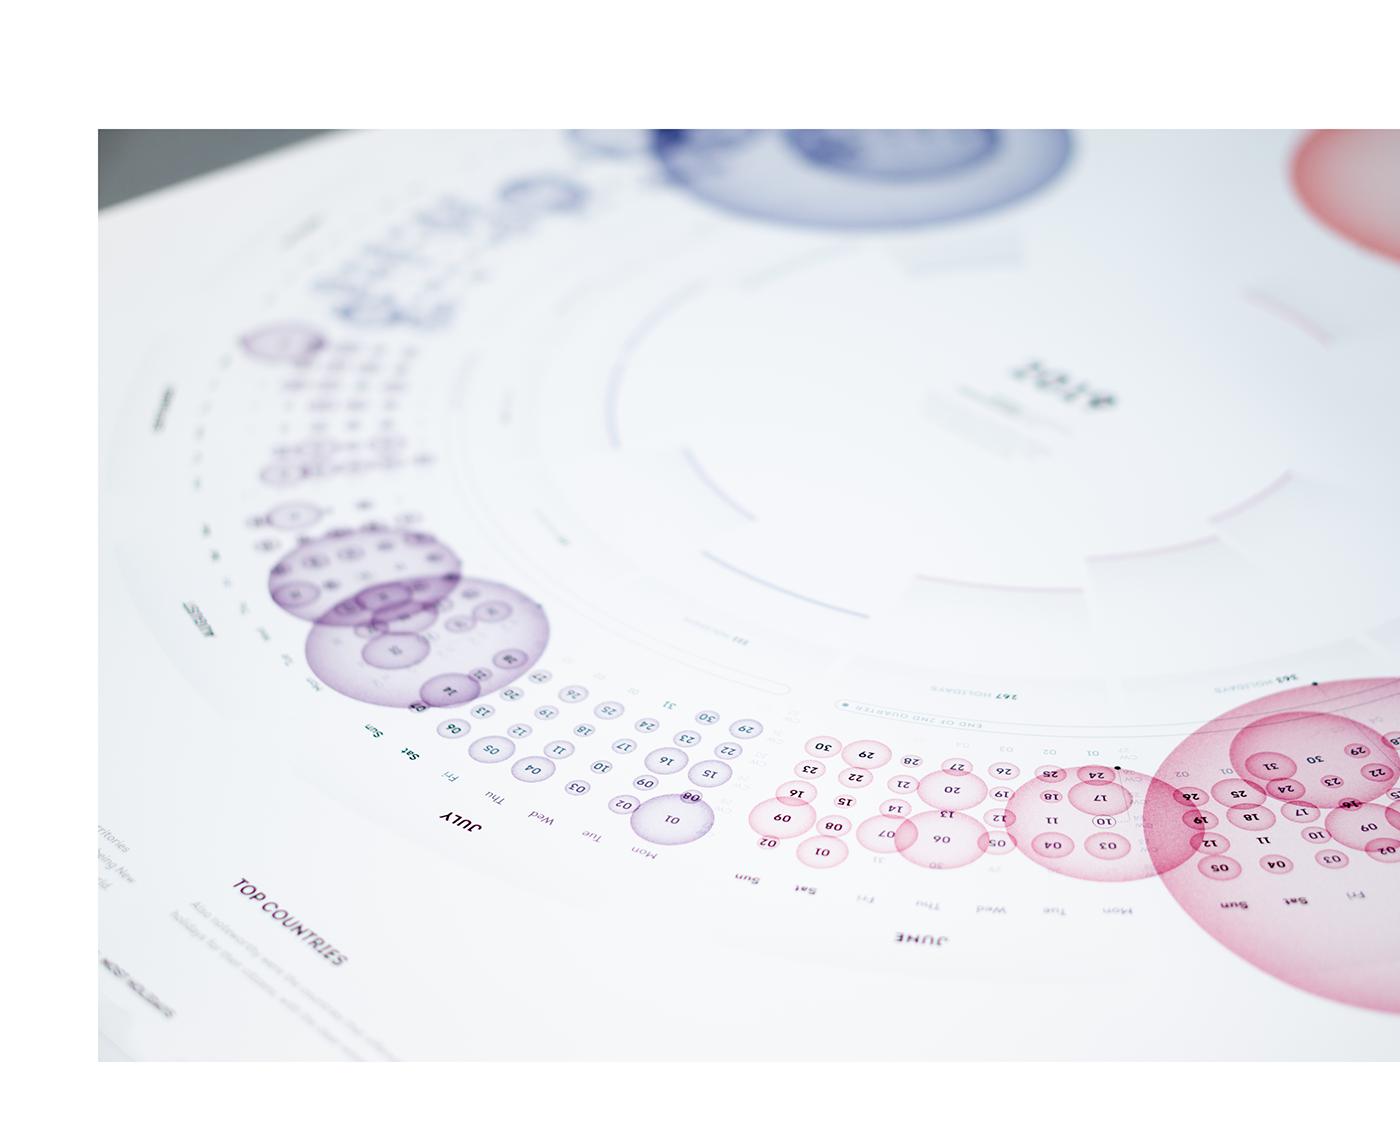 calendar infographic infographics poster information design holidays celebration